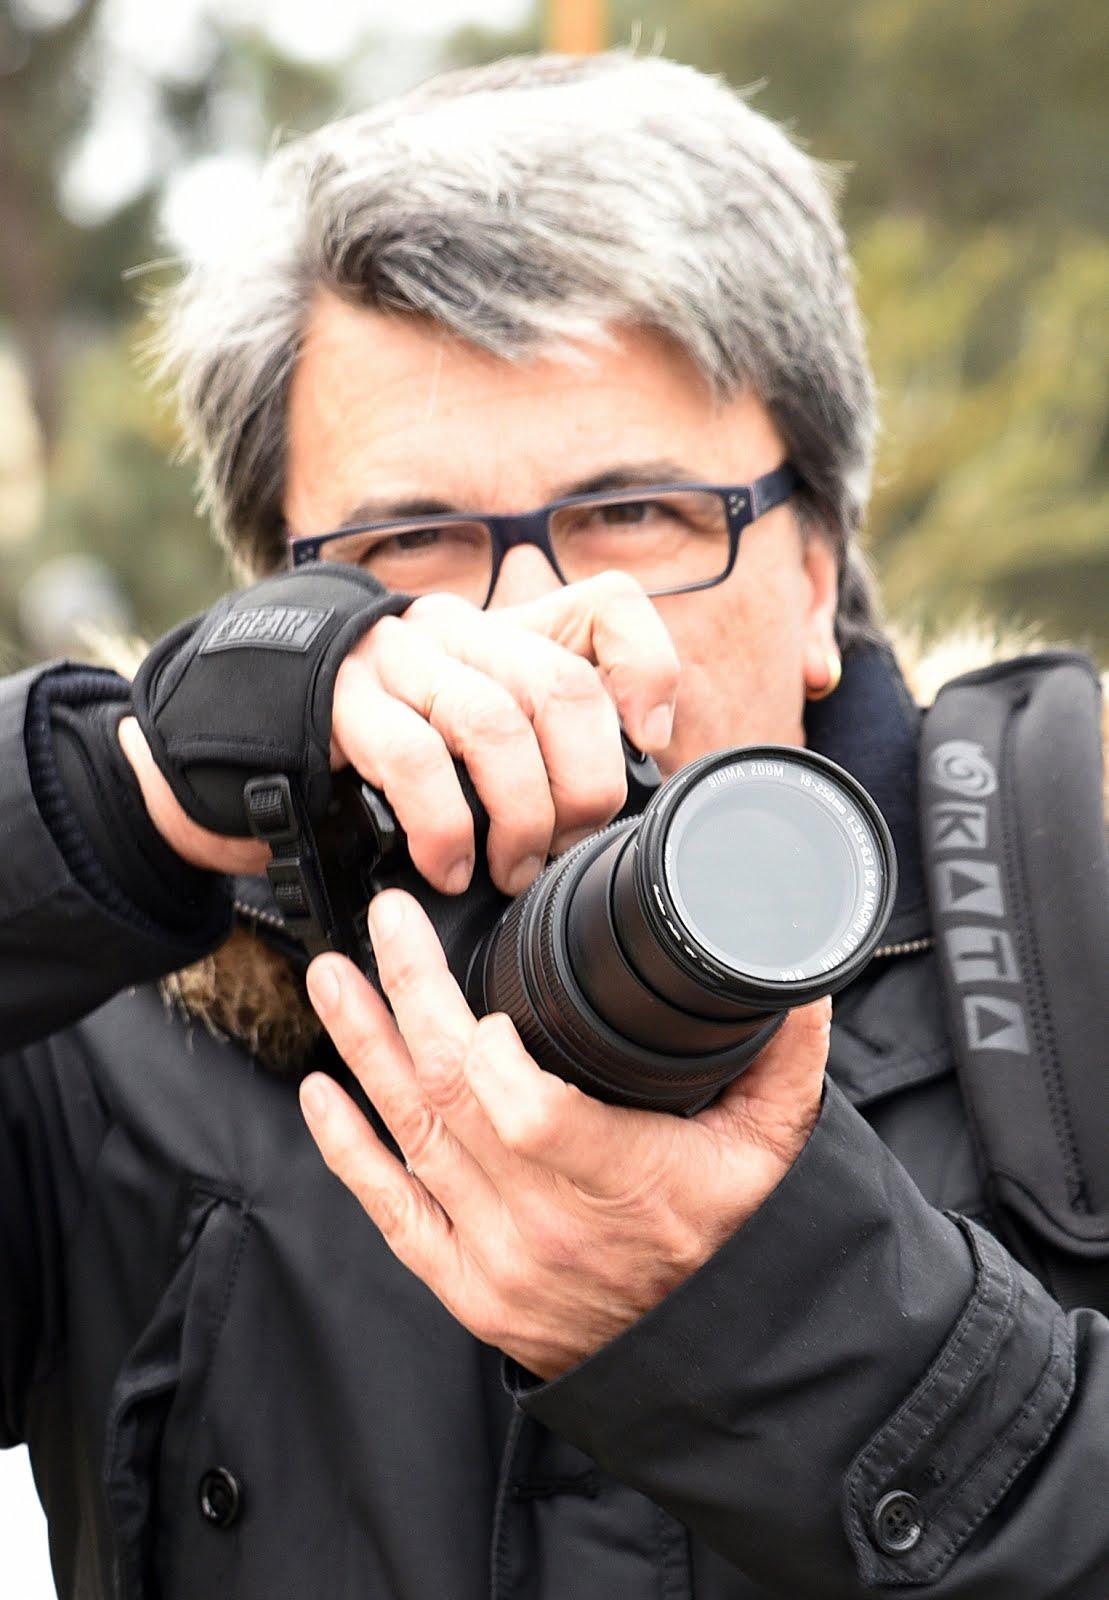 J. Carlos Gil Dominguez